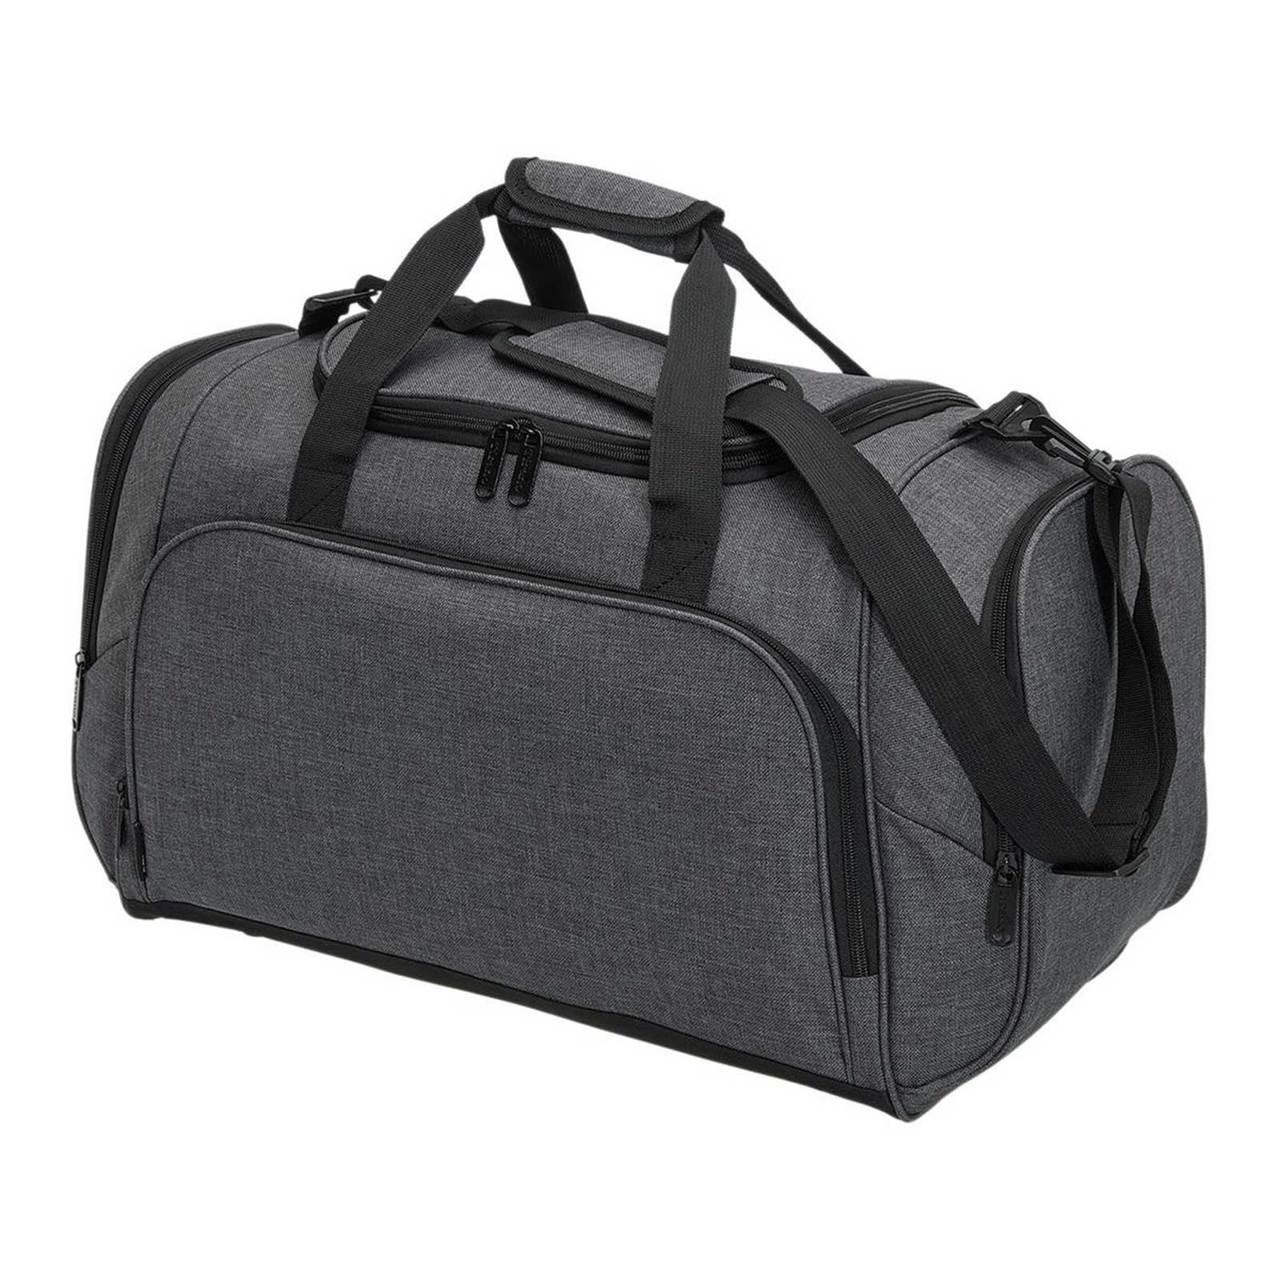 eae231f8fd46 TIRANO | Plain Canvas-Like Travel Sports Bag